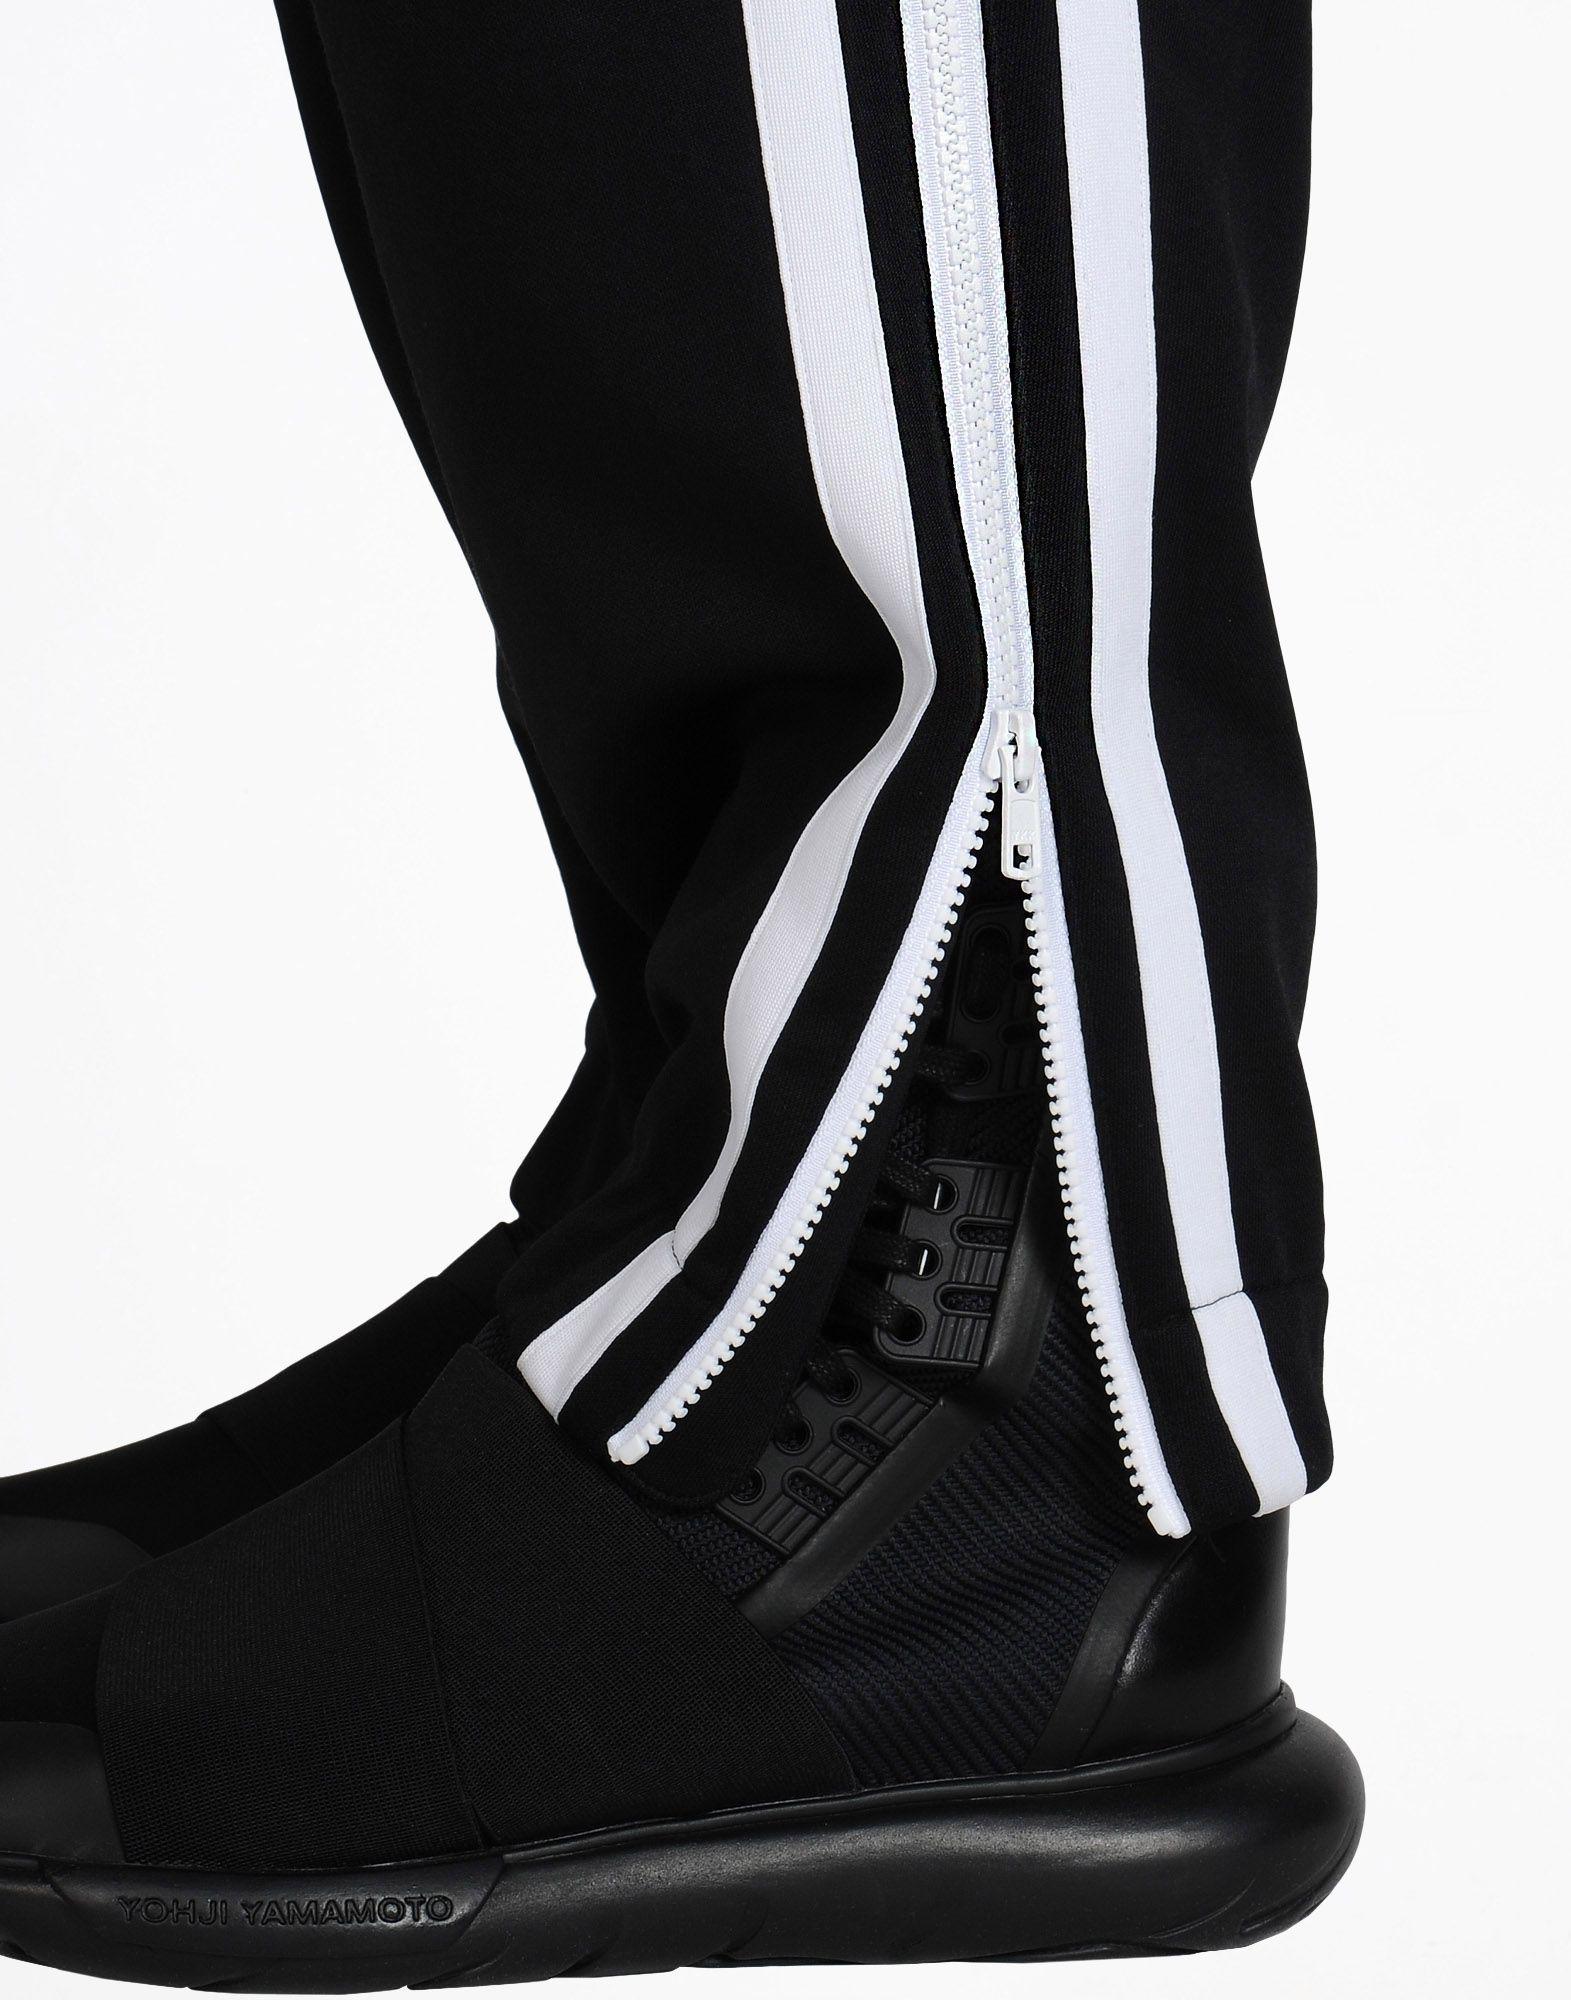 Y-3 3-STRIPES TRACK PANT PANTS man Y-3 adidas